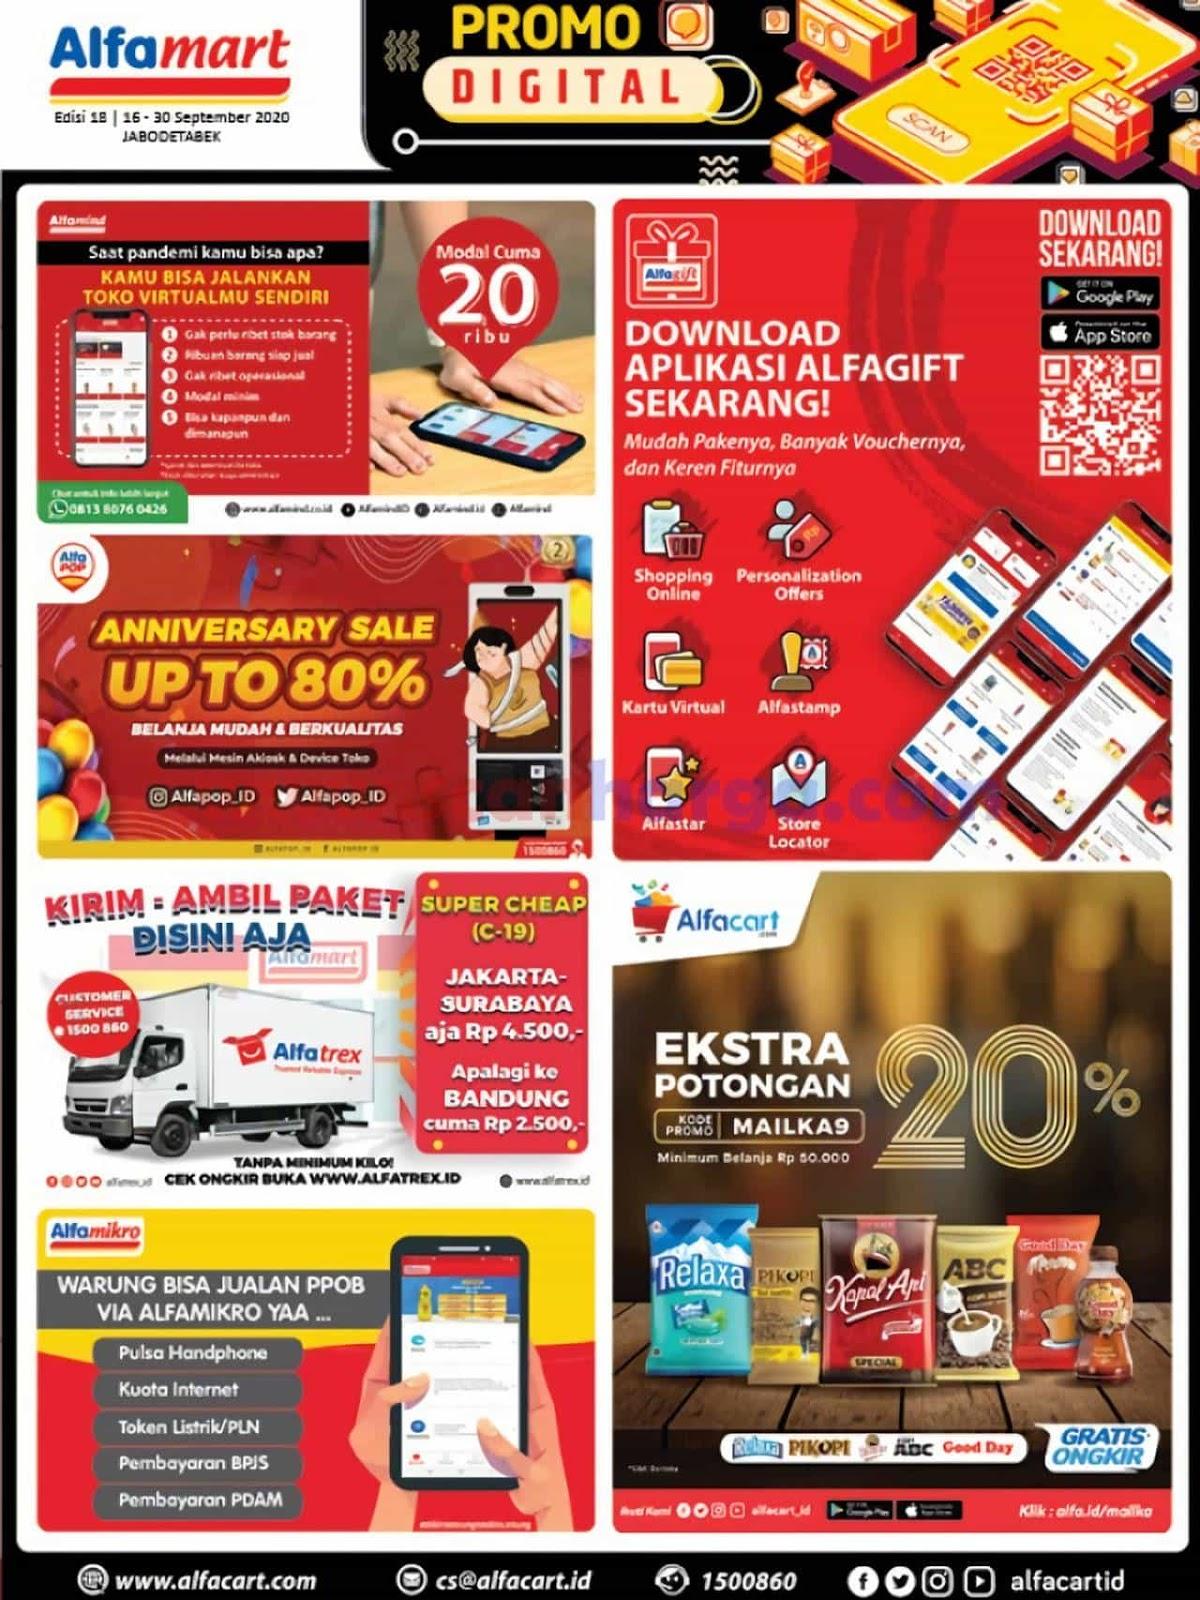 Katalog Promo Alfamart 16 - 30 September 2020 17